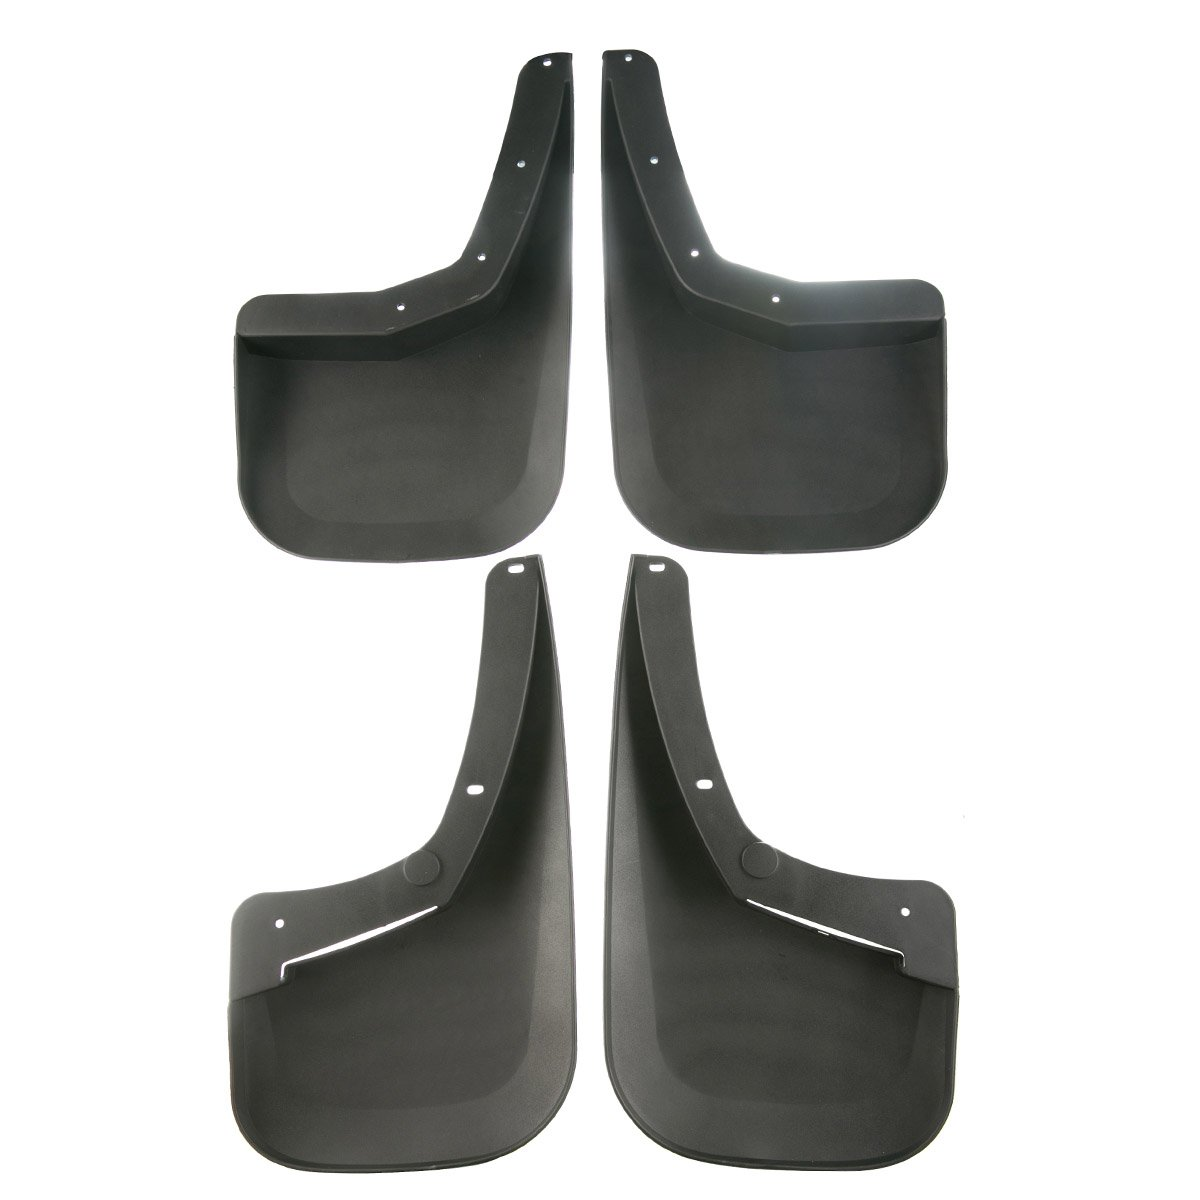 Set of 4 Mud Flaps Splash Guards for Chevrolet Silverado/1500 2500 HD 3500 HD 2007-2013 Single/Rear/Wheels/only YTAUTOPARTS